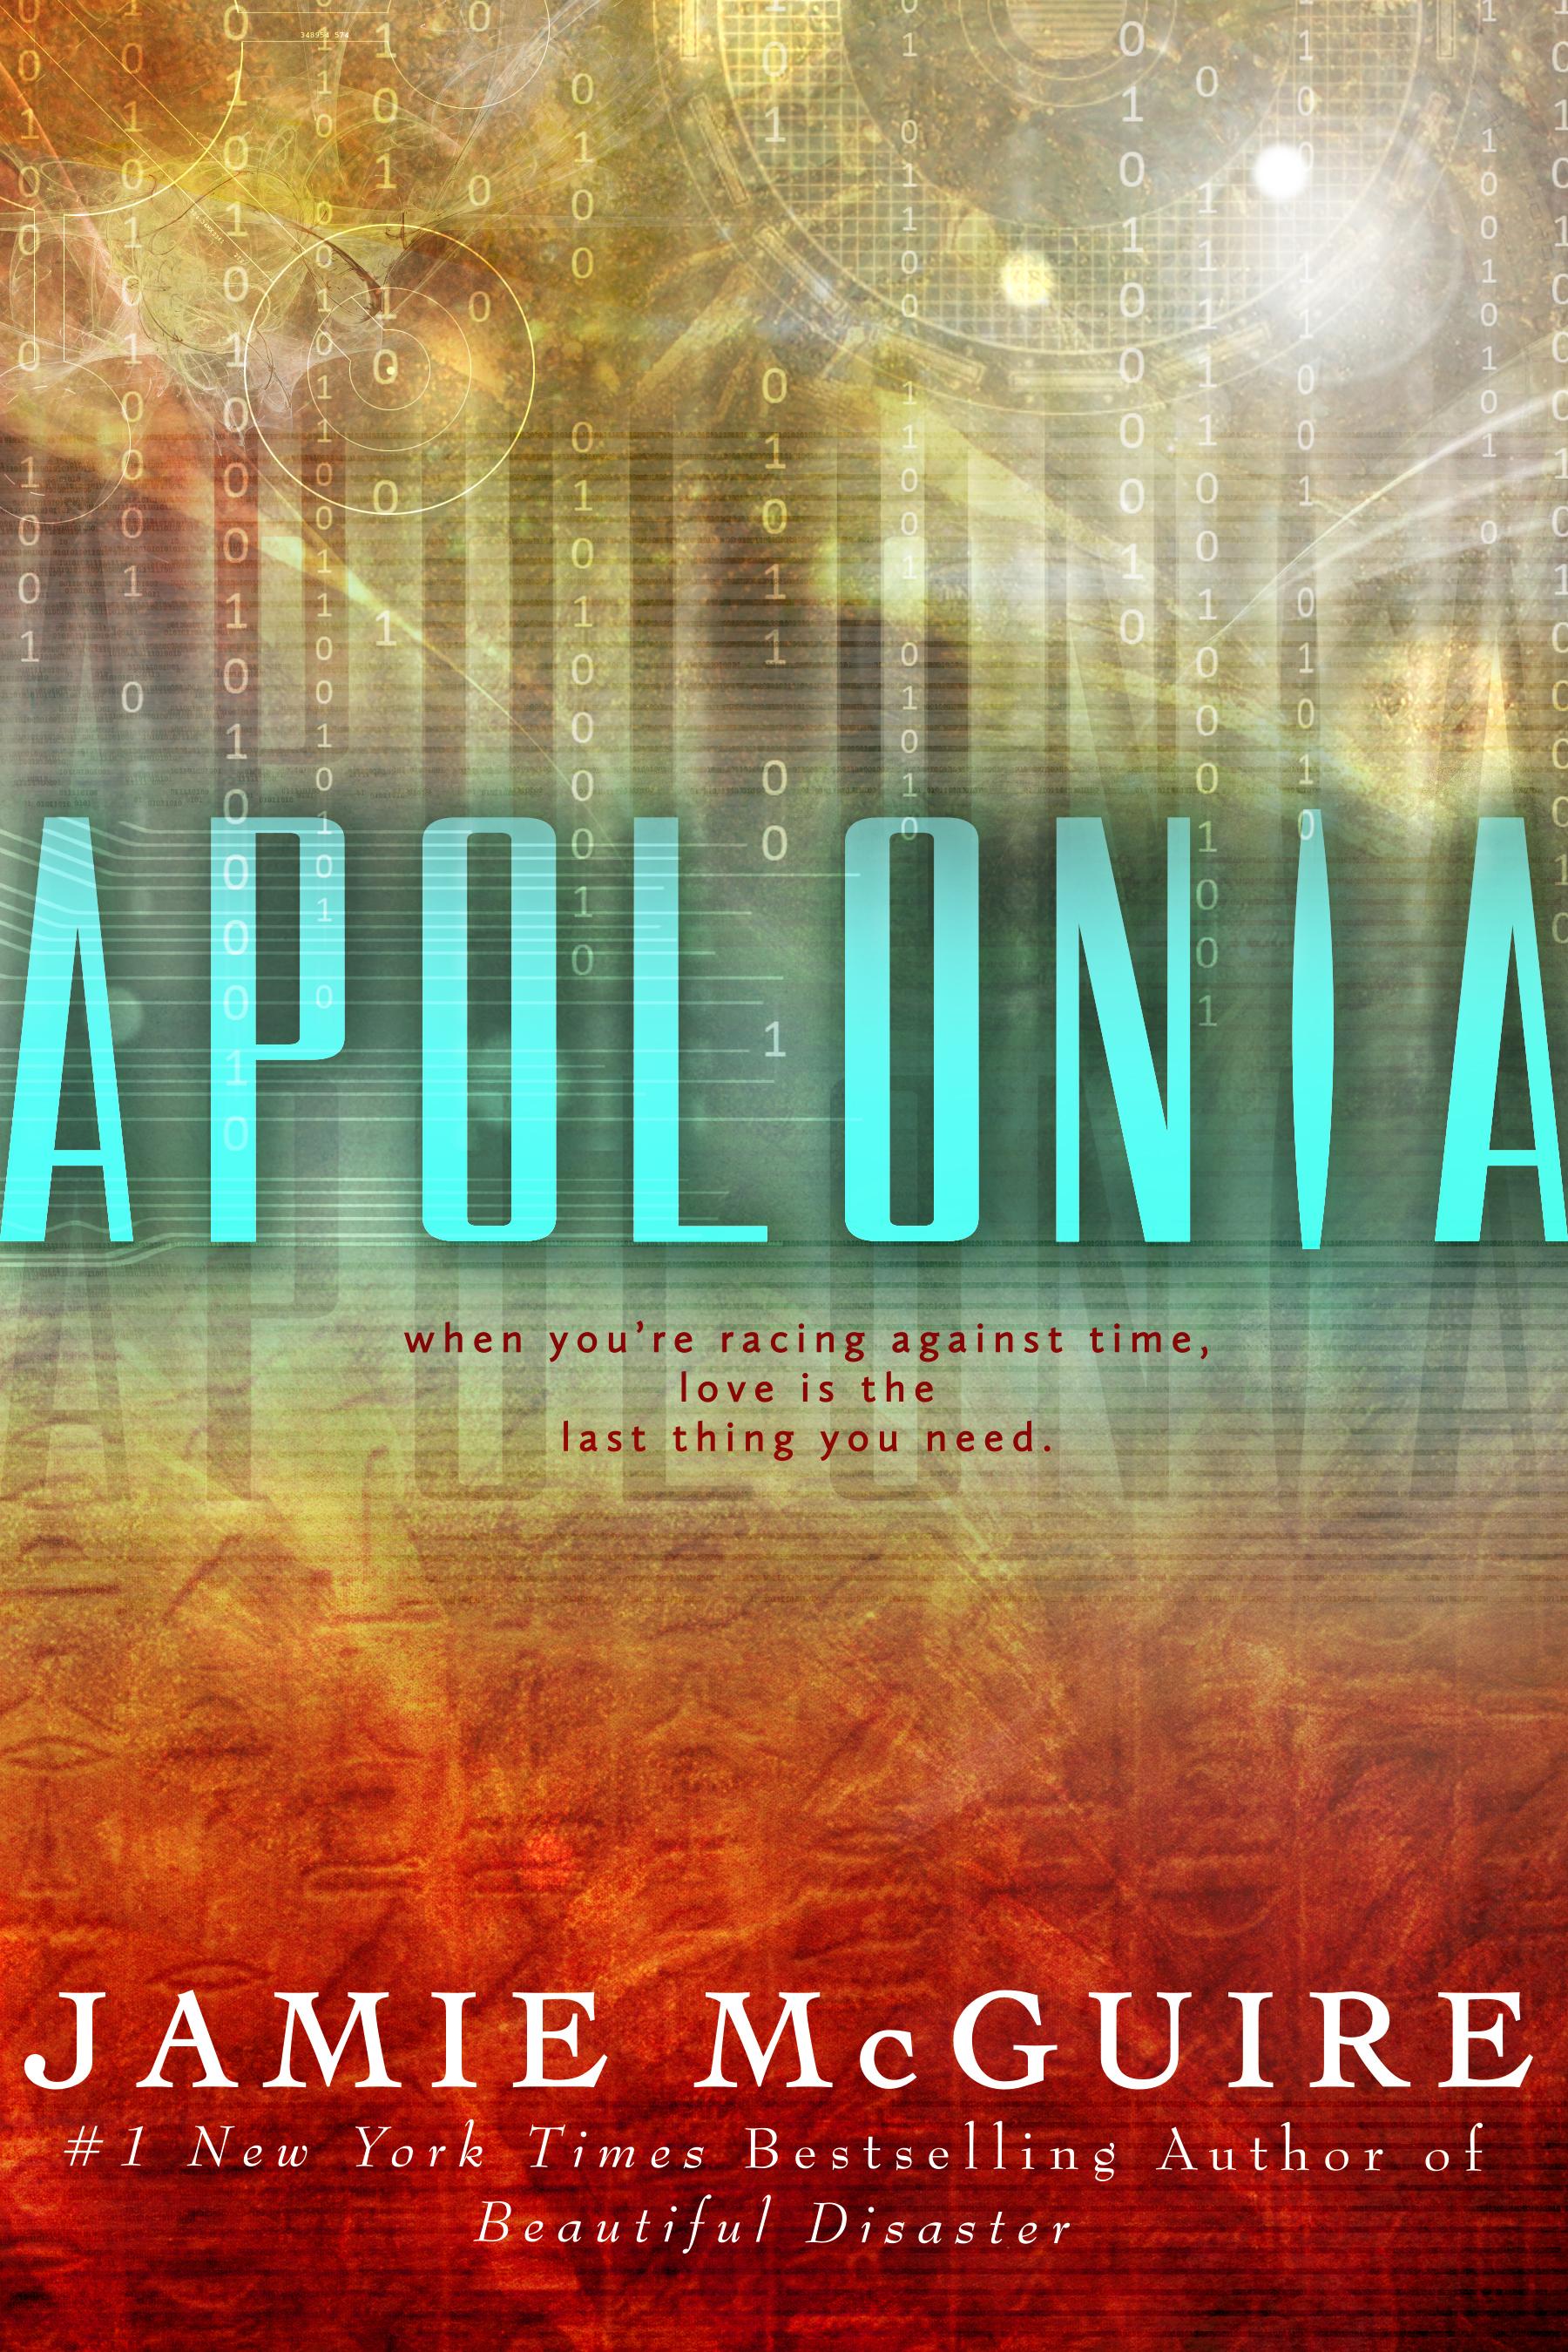 ApoloniaCover.jpg